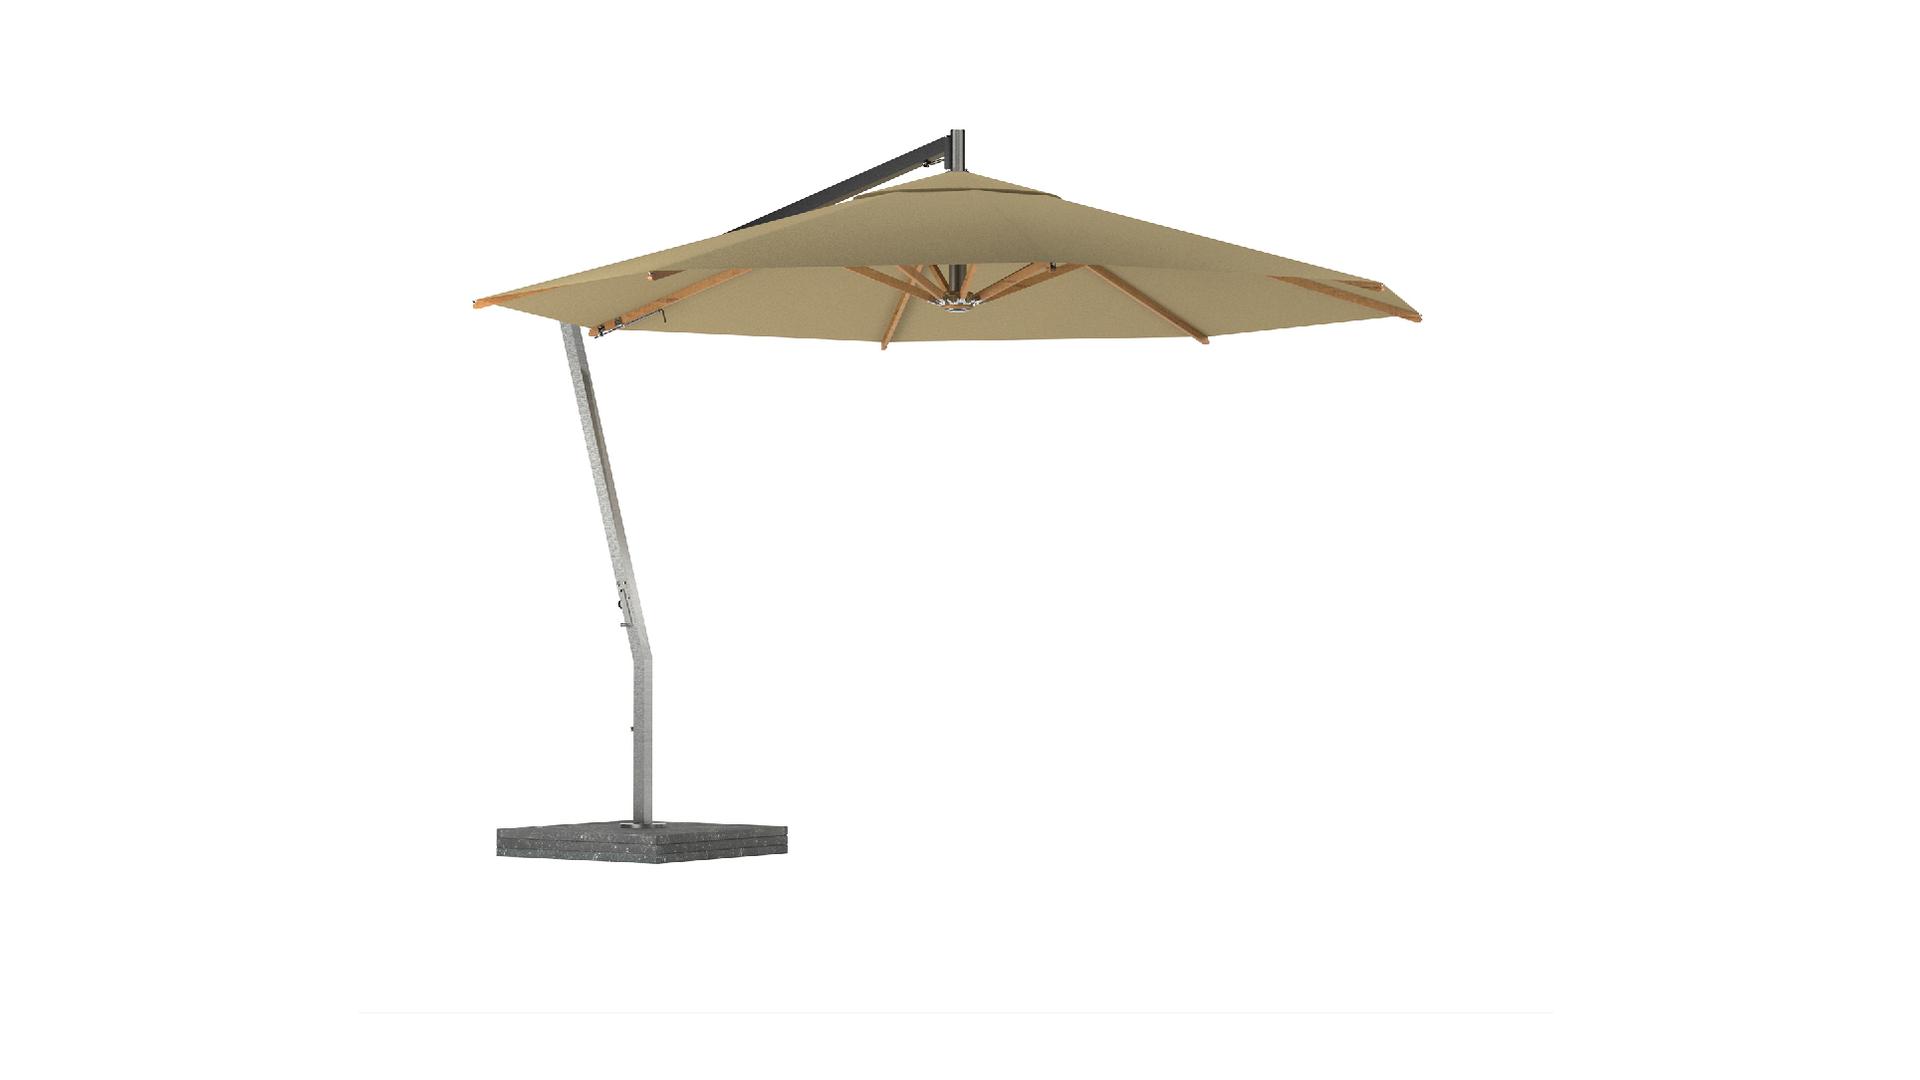 Shady groen parasol.png